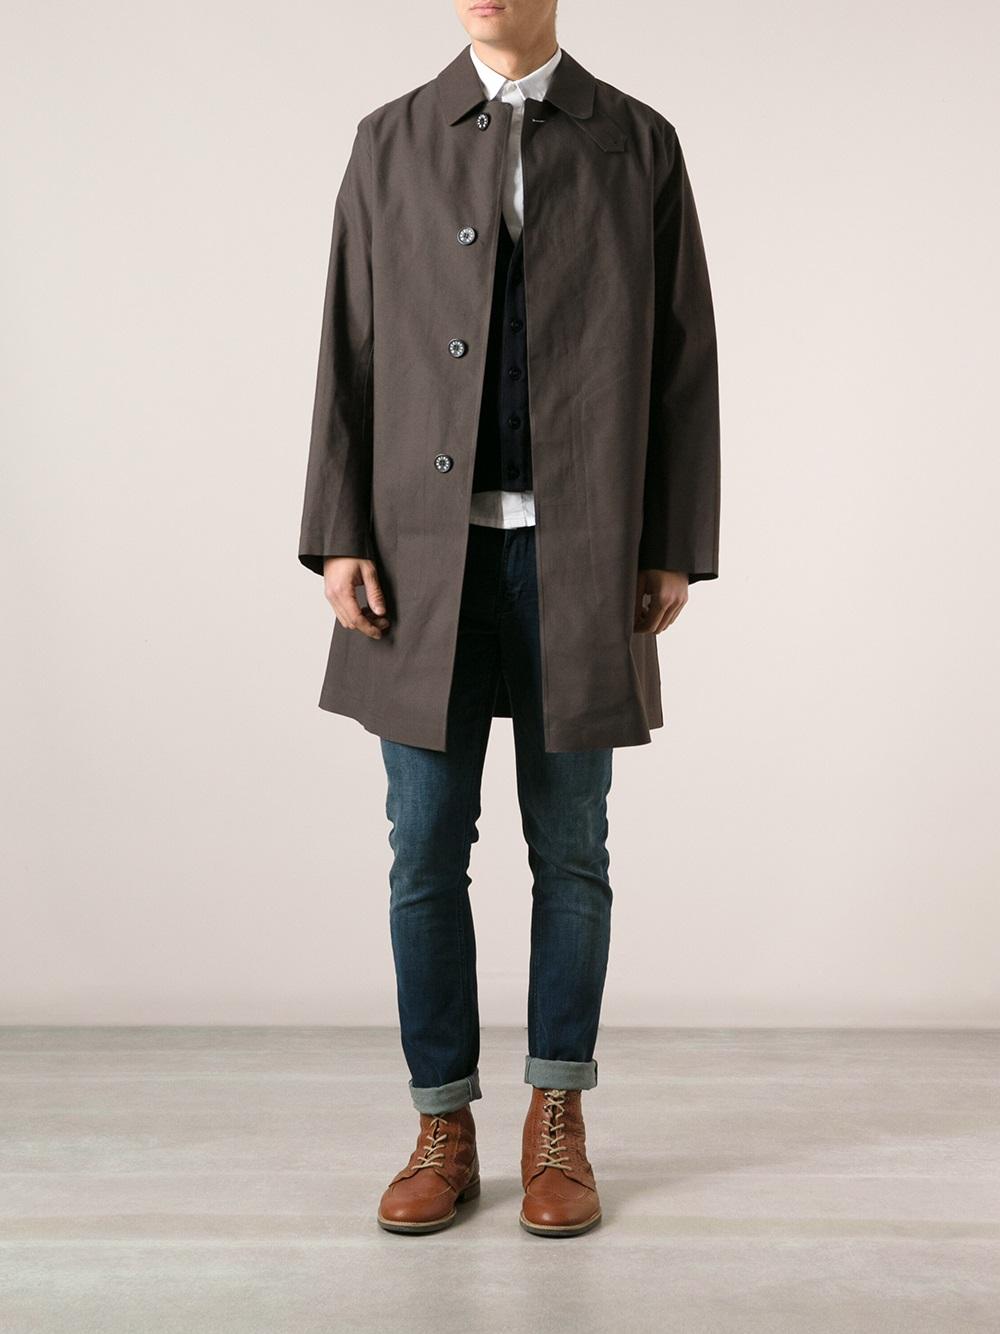 Mackintosh 'dunkeld' Trenchcoat in Brown for Men | Lyst